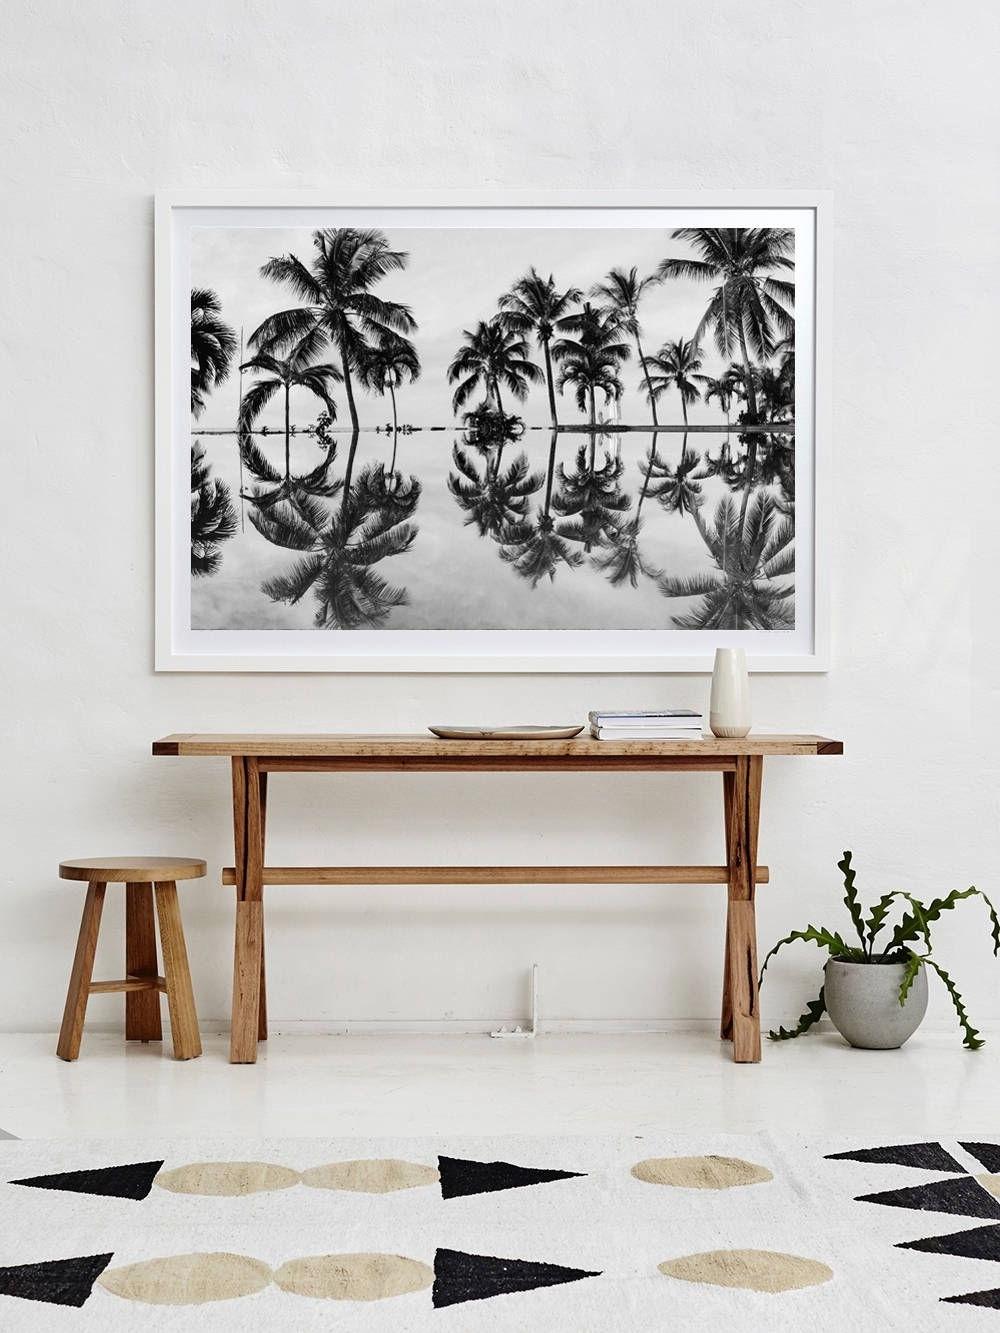 Coastal Wall Art Throughout 2017 Black And White Print, Coastal Decor Print, Tropical Print (View 12 of 15)